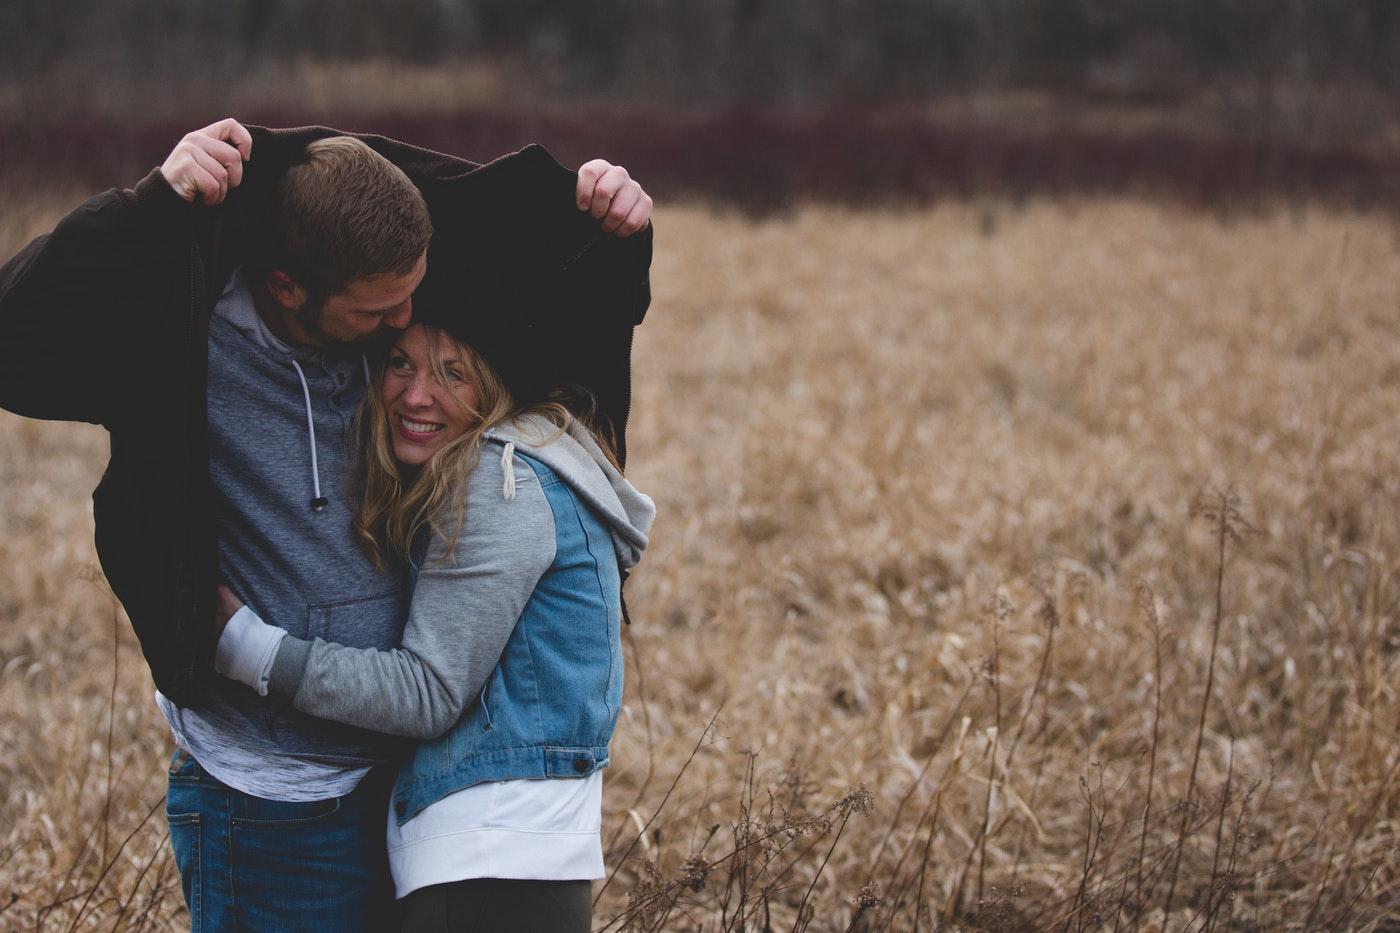 Мужчина и женщина прижимаются фото, милашки на вебку